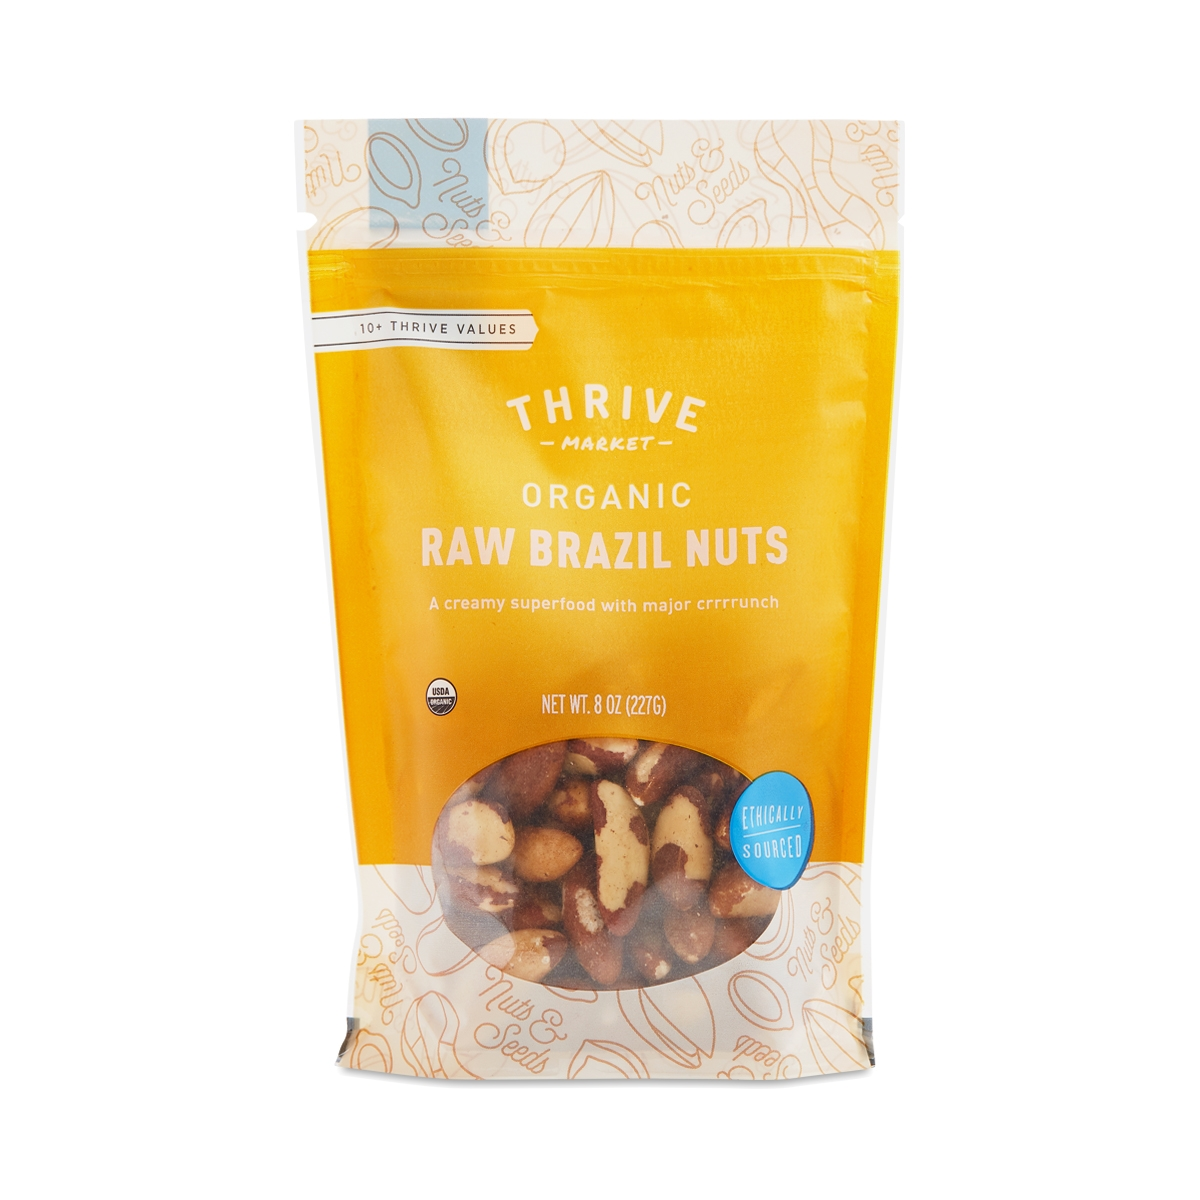 Thrive Market Organic Raw Brazil Nuts 8 oz bag